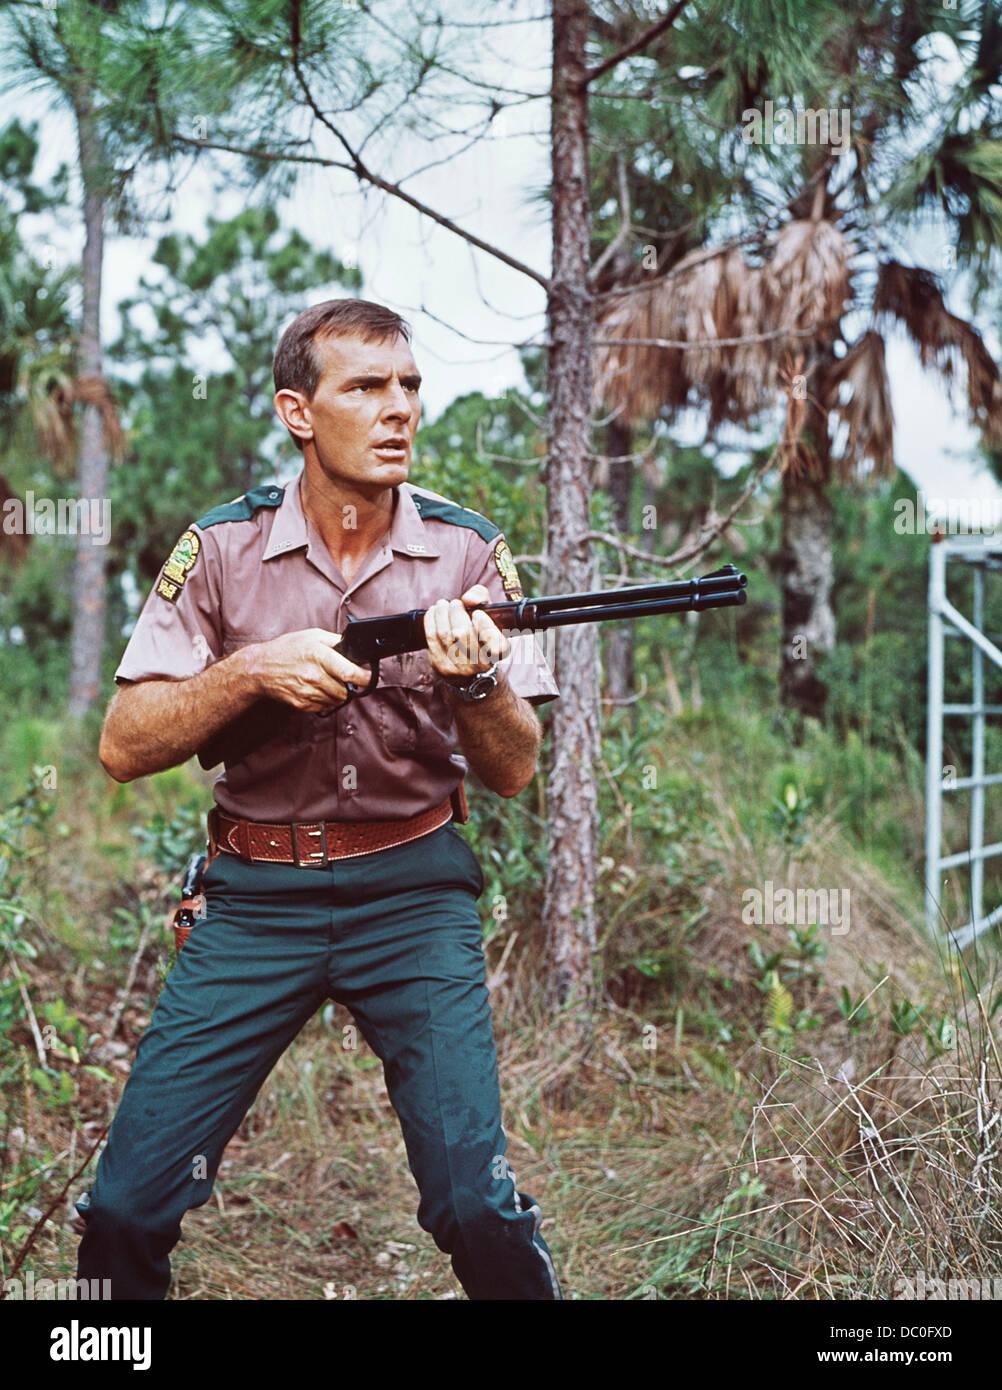 1960s 1967 GENTLE GIANT MOVIE BASED ON GENTLE BEN TV SERIES DENNIS WEAVER WITH SHOTGUN - Stock Image